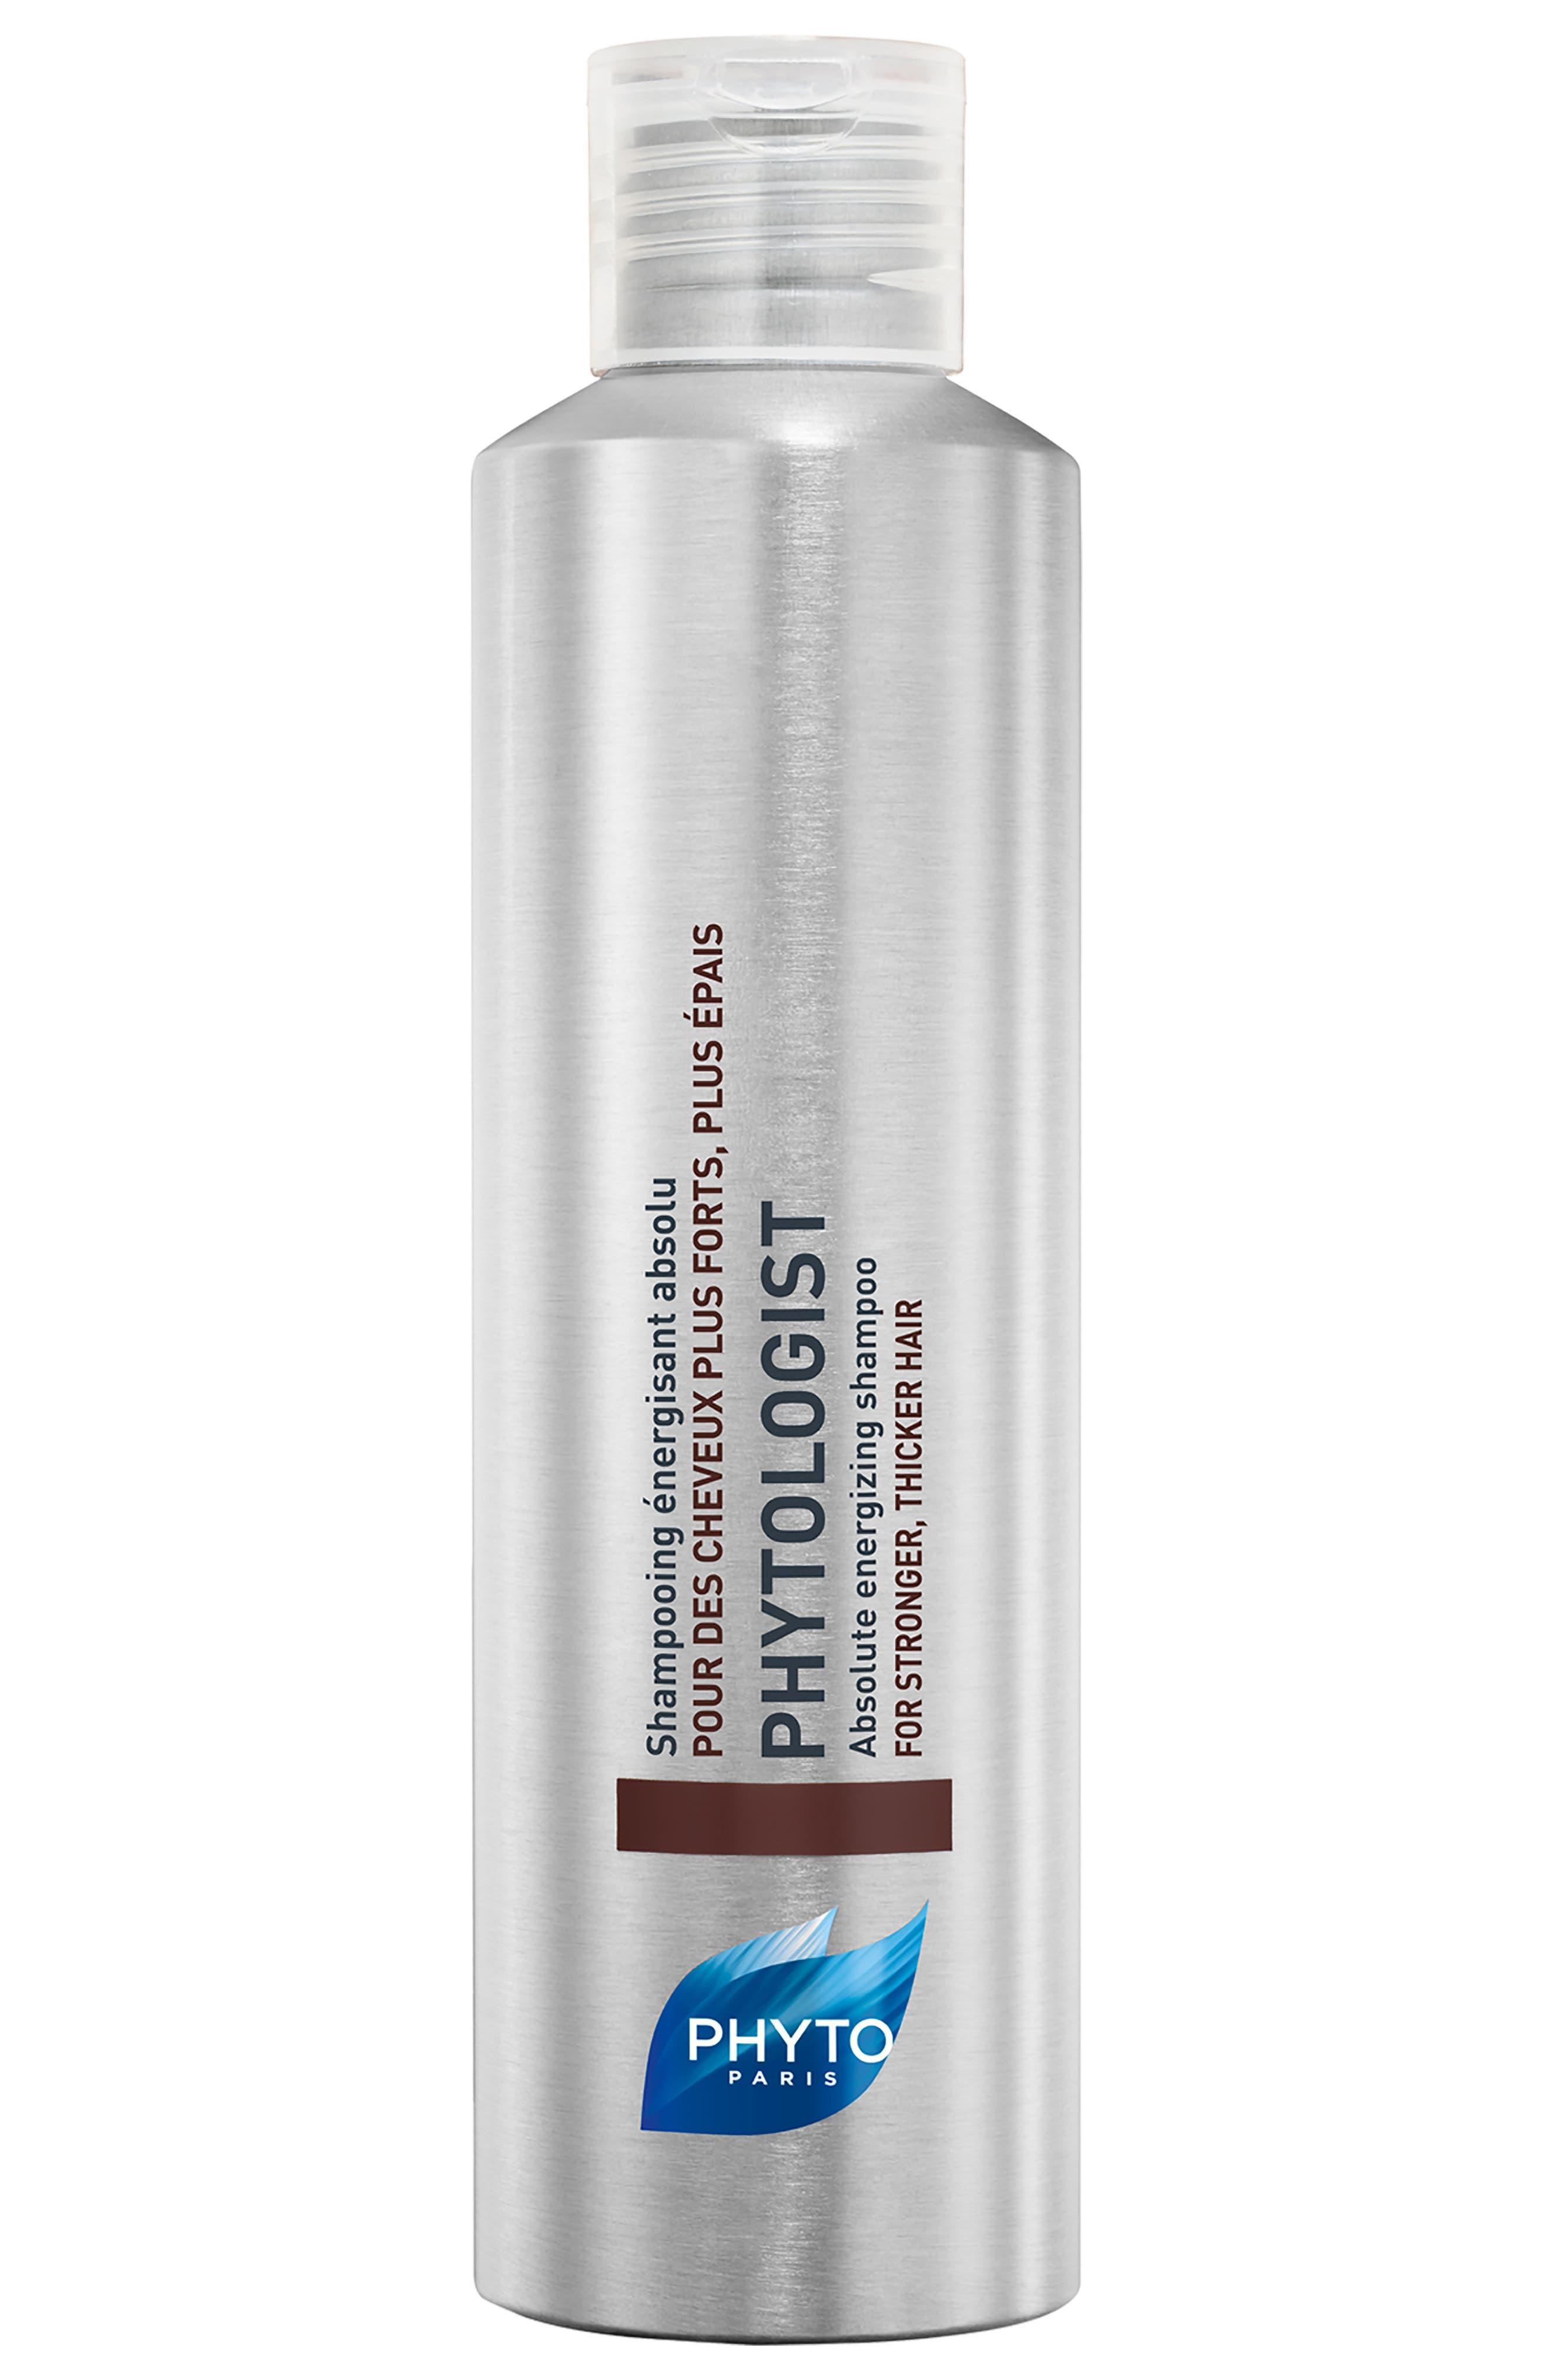 Alternate Image 1 Selected - PHYTO PHYTOLOGIST Absolute Energizing Shampoo